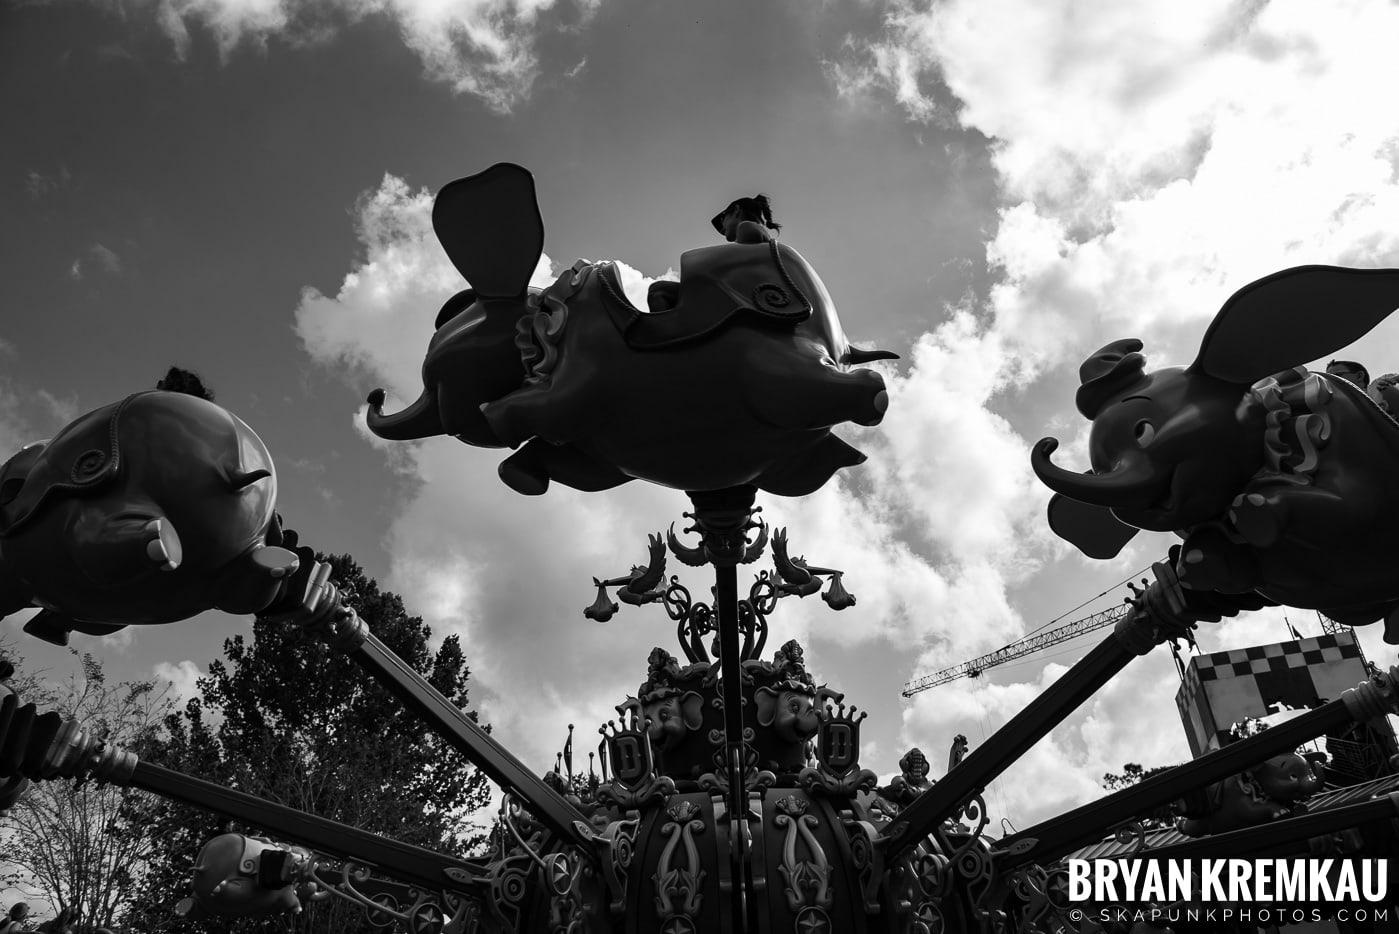 Walt Disney World Vacation: Days 1 & 2 (Disney Springs & Magic Kingdom, Epcot) September 29th - 30th 2019 (21)